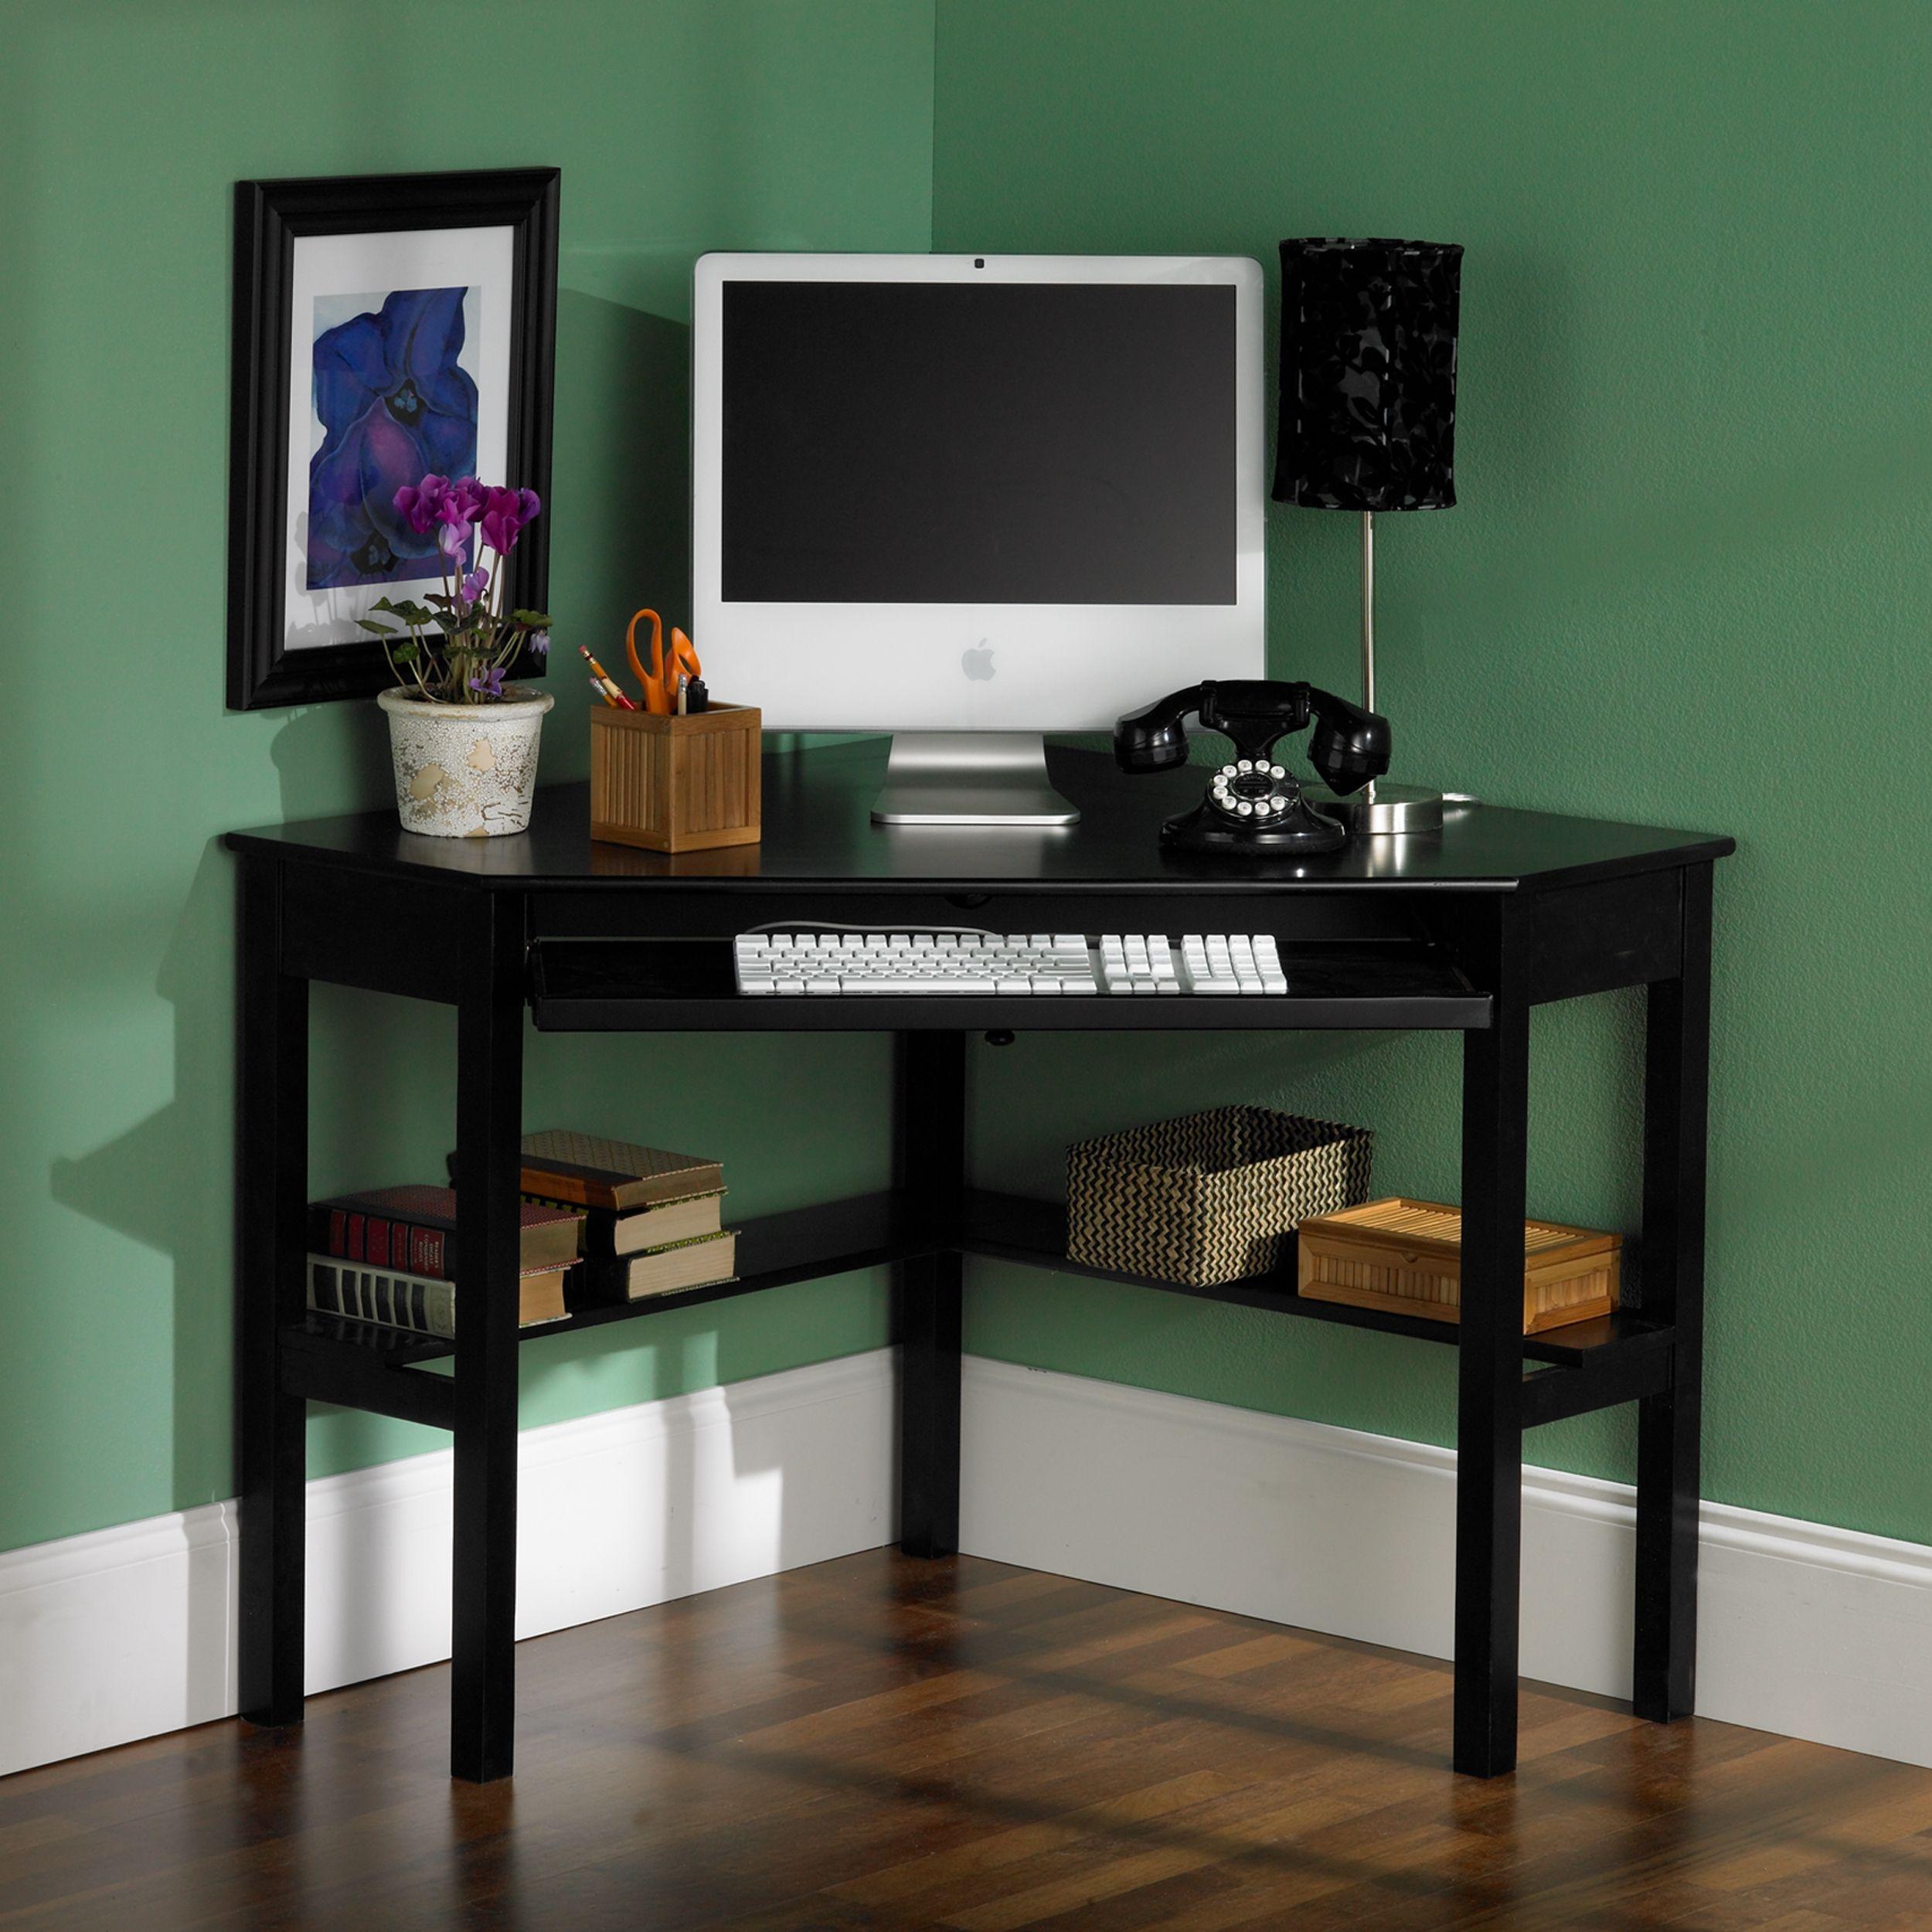 Corner Computer Desk Ashley Furniture Homestore Black Corner Desk Black Corner Computer Desk Desks For Small Spaces